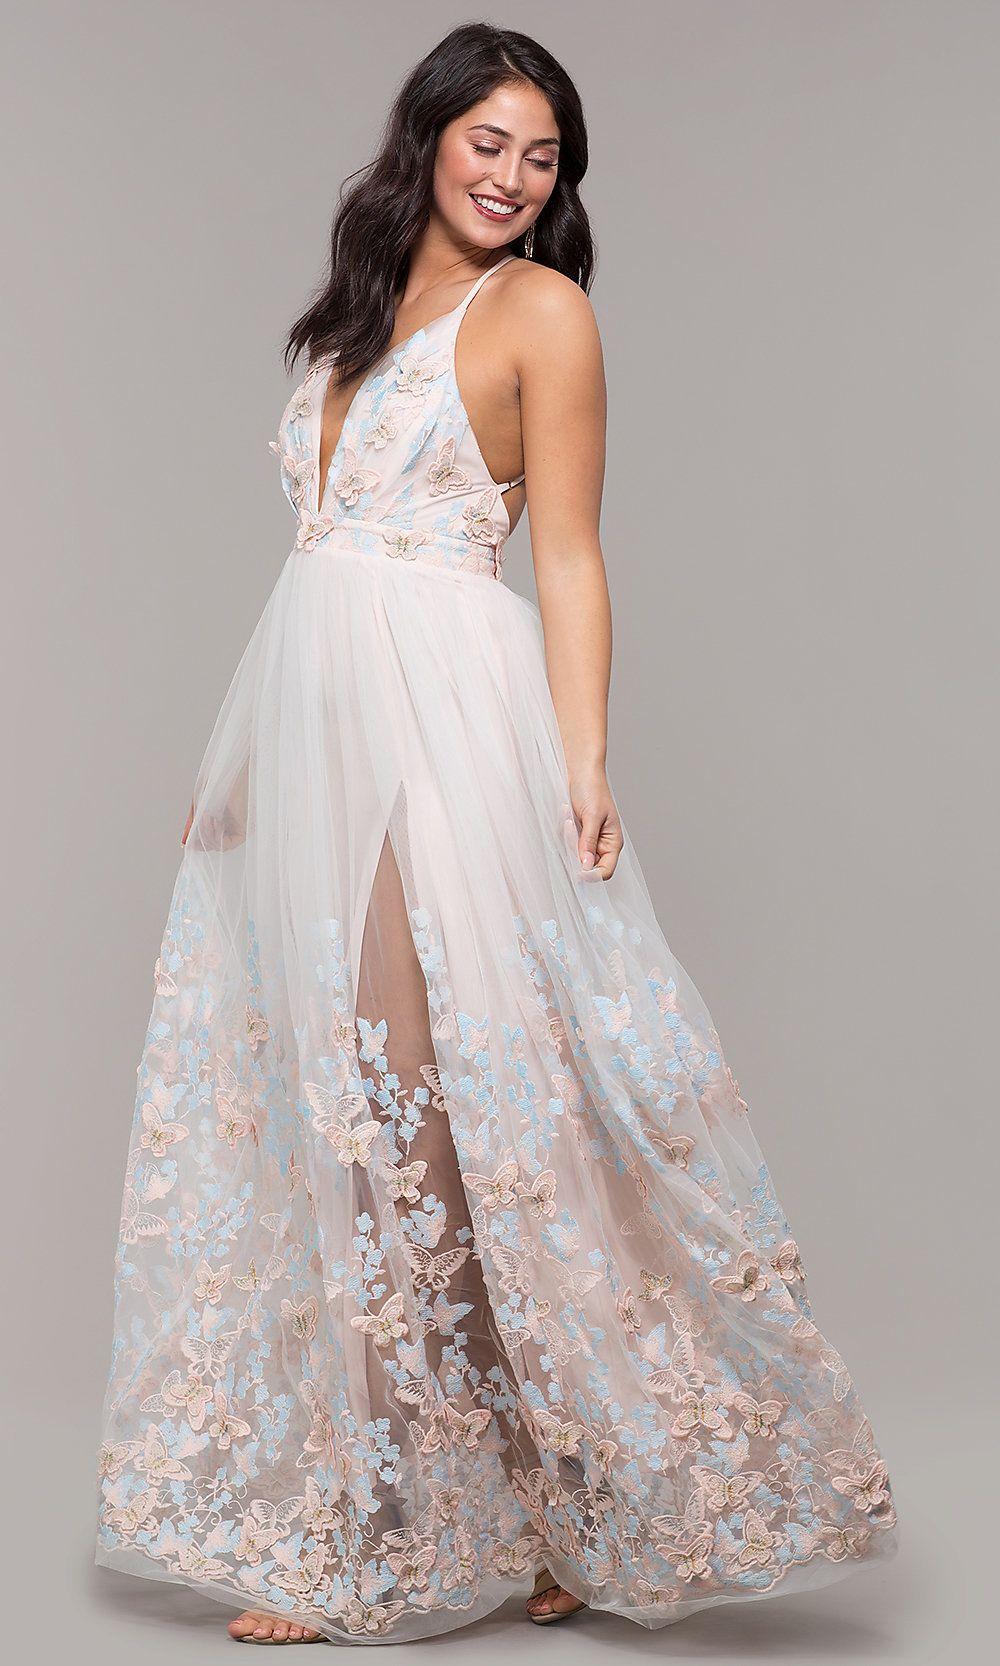 0c0a2461bbb Long V-Neck 3-D-Appliqued Prom Dress by Kalani Hilliker in 2019 ...